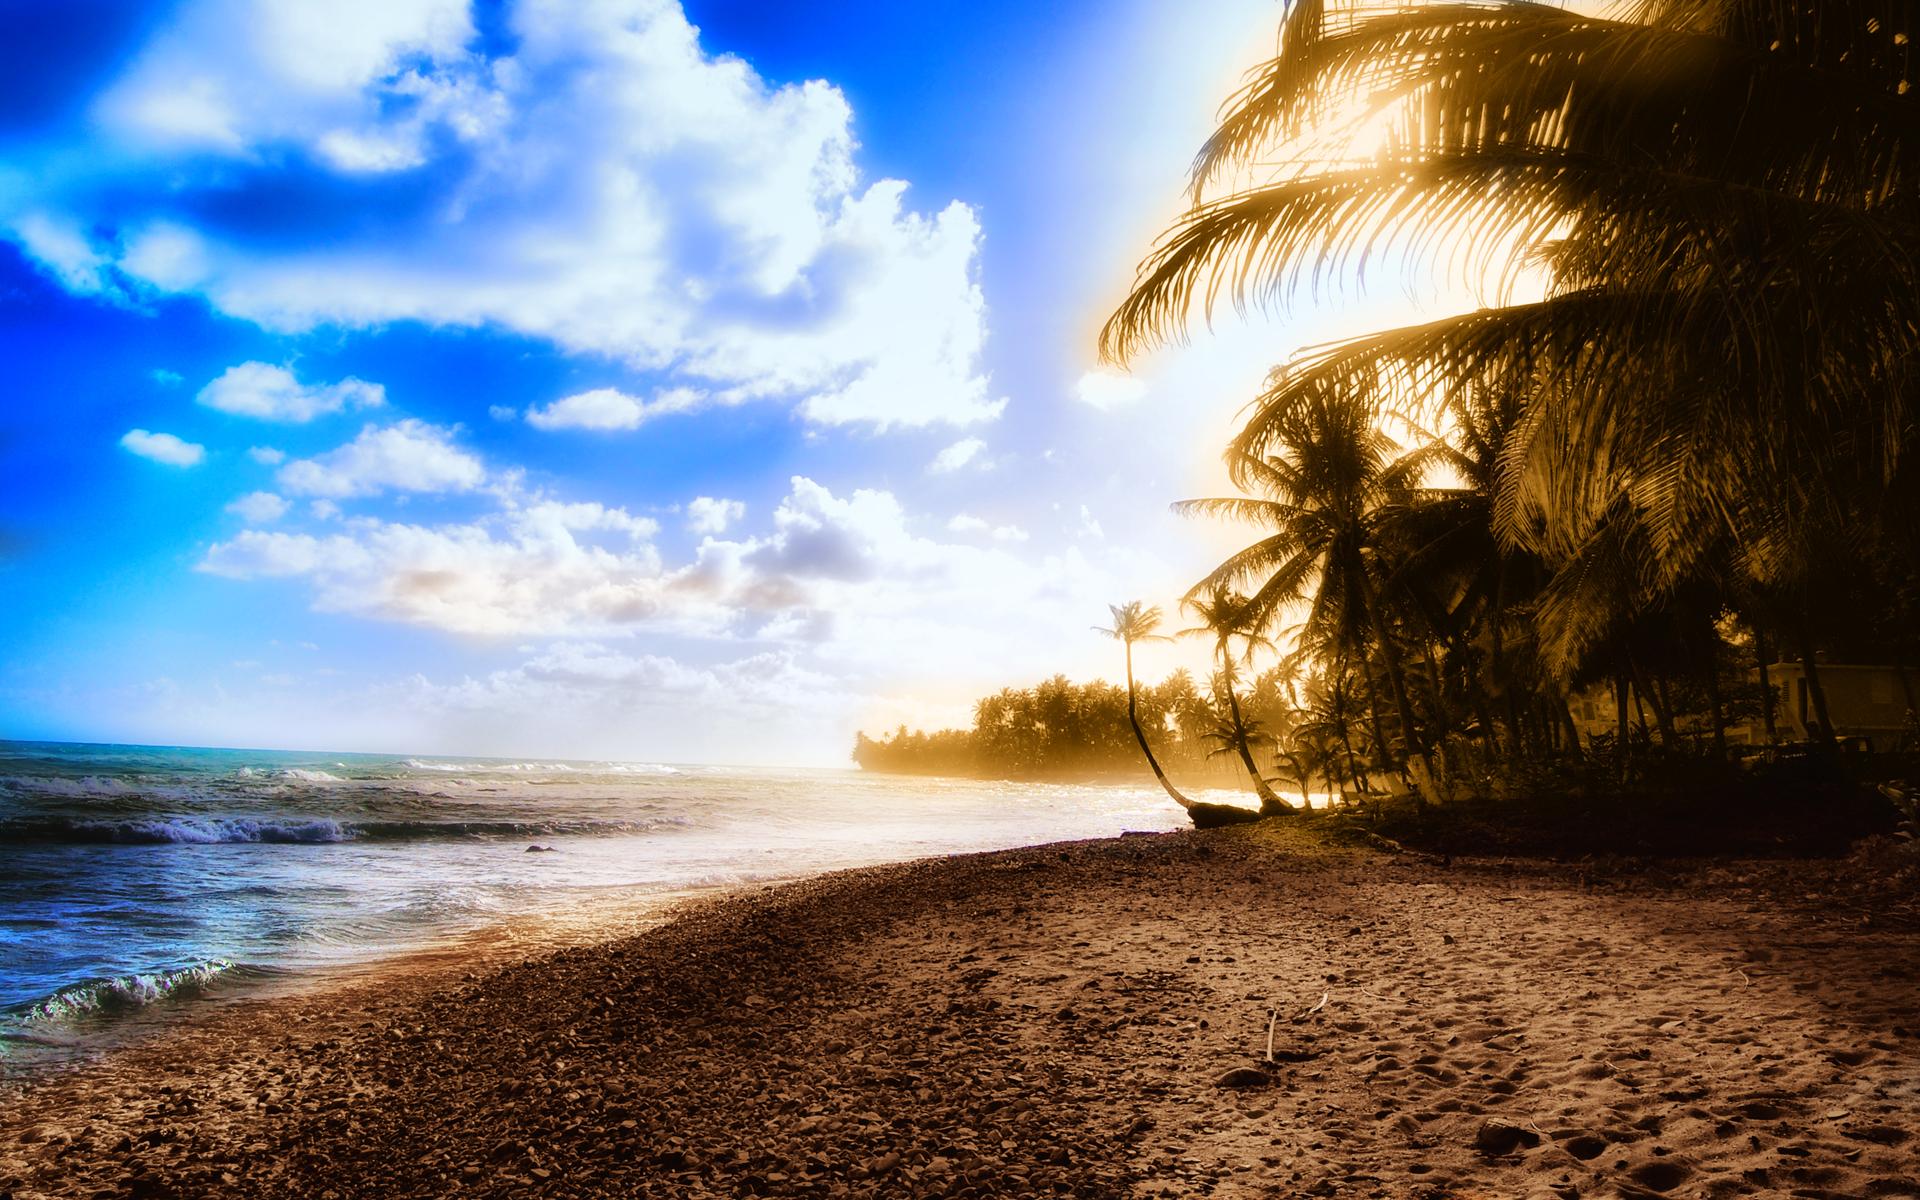 wallpapers screensavers summer sunbay 1920x1200